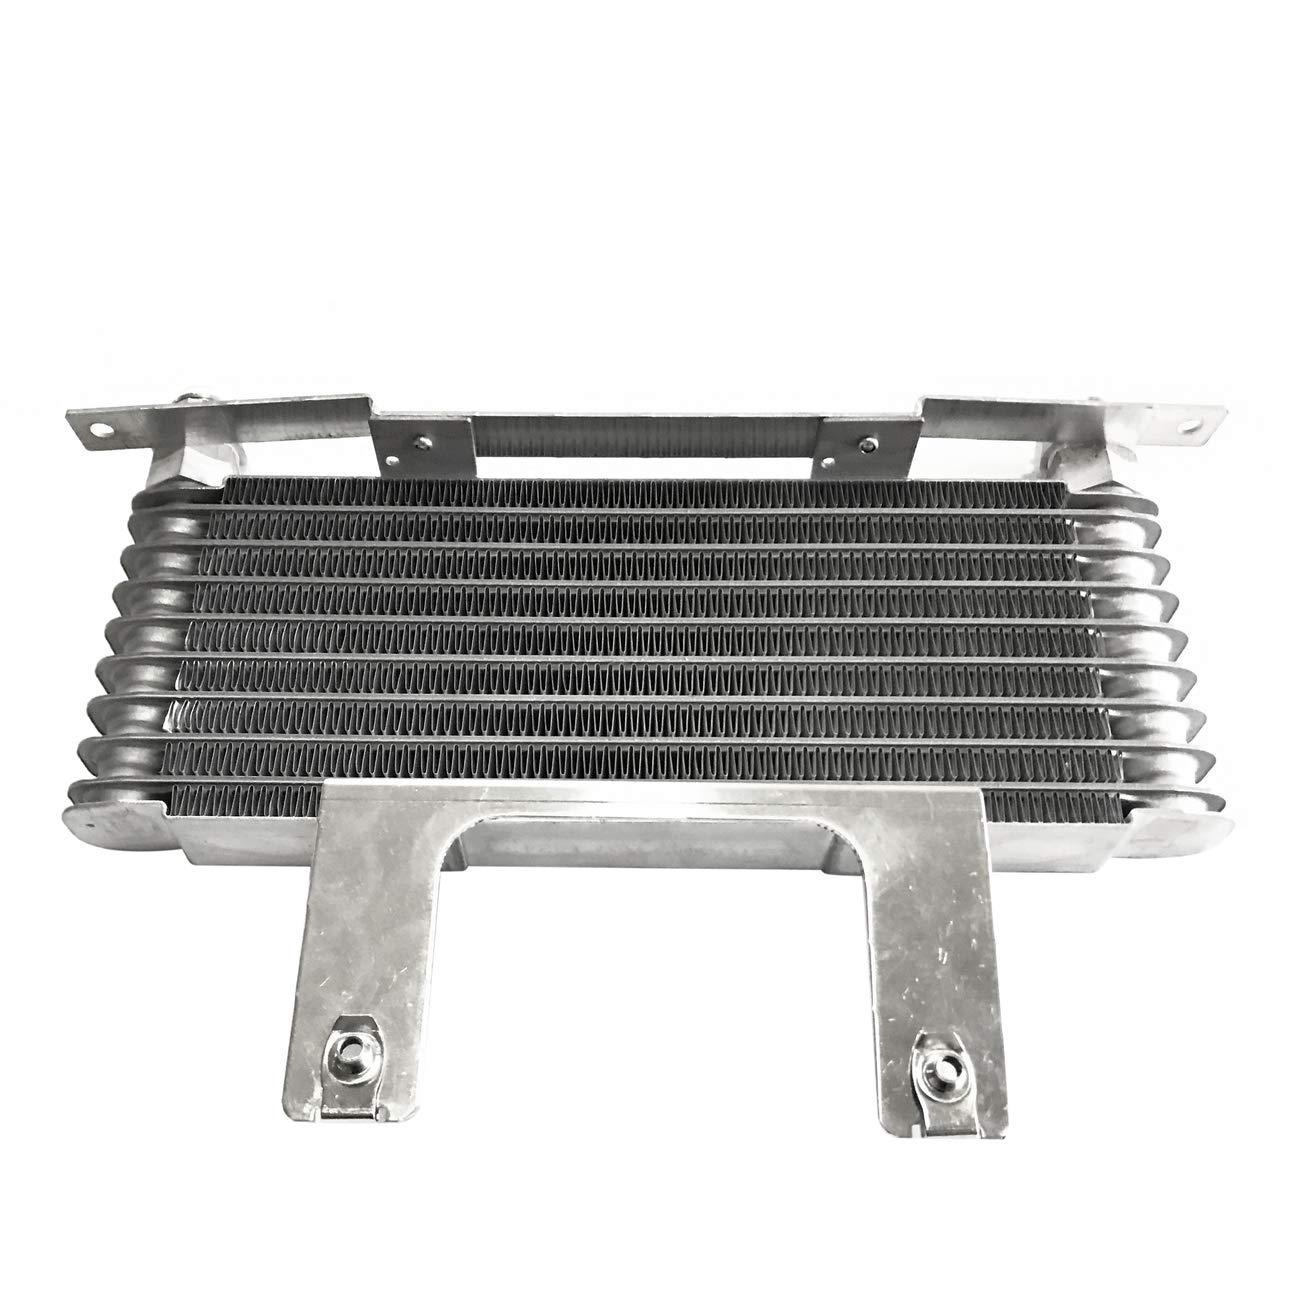 SKP SKTOC019 Auto Trans Oil Cooler